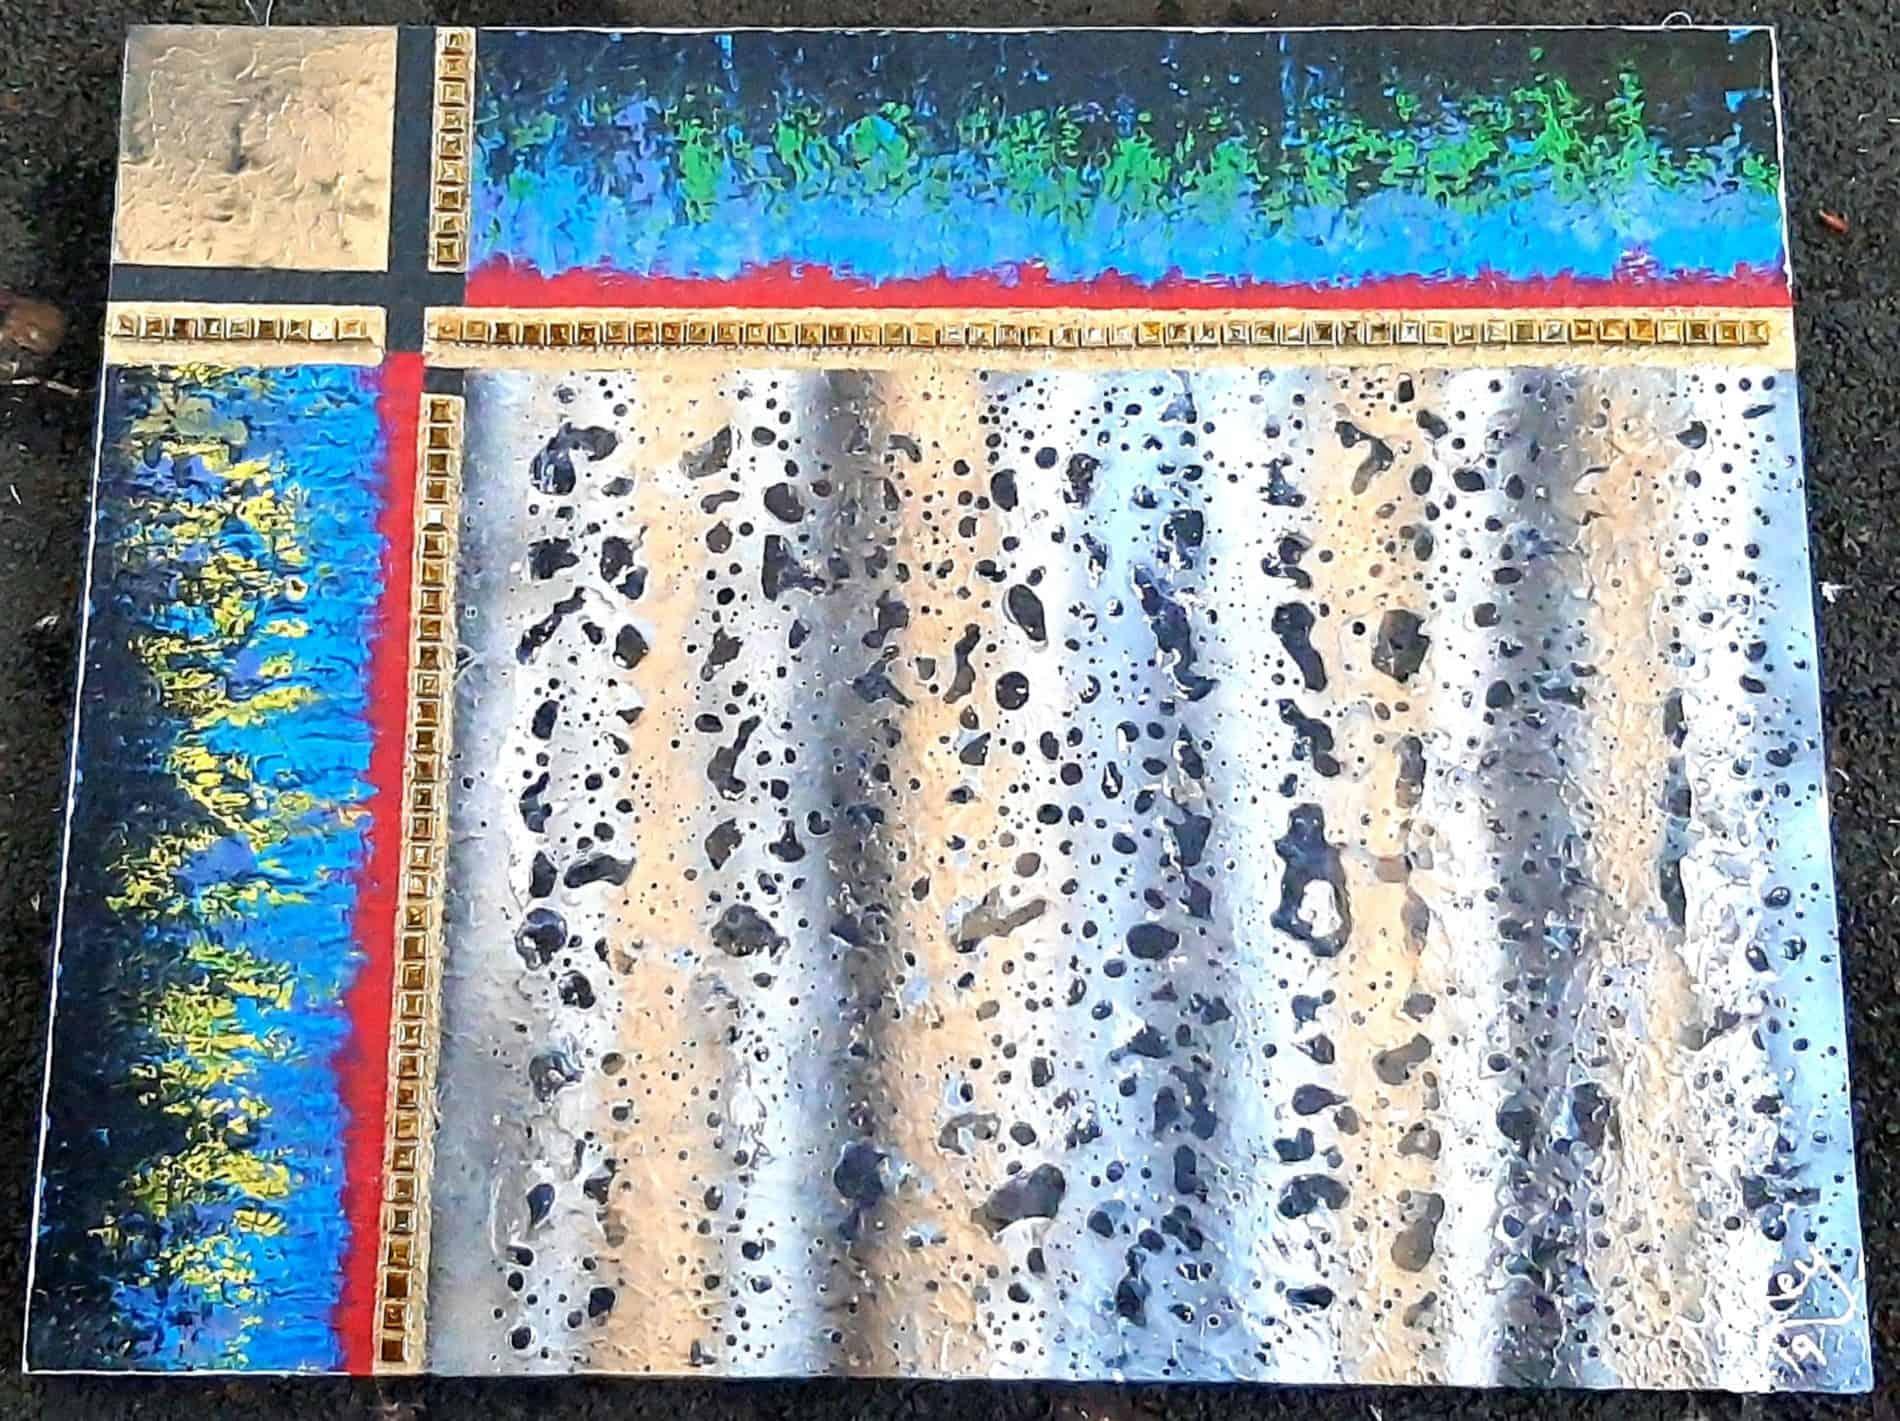 mauritian-artist-yusuf-makey-planet-3.0-city-space